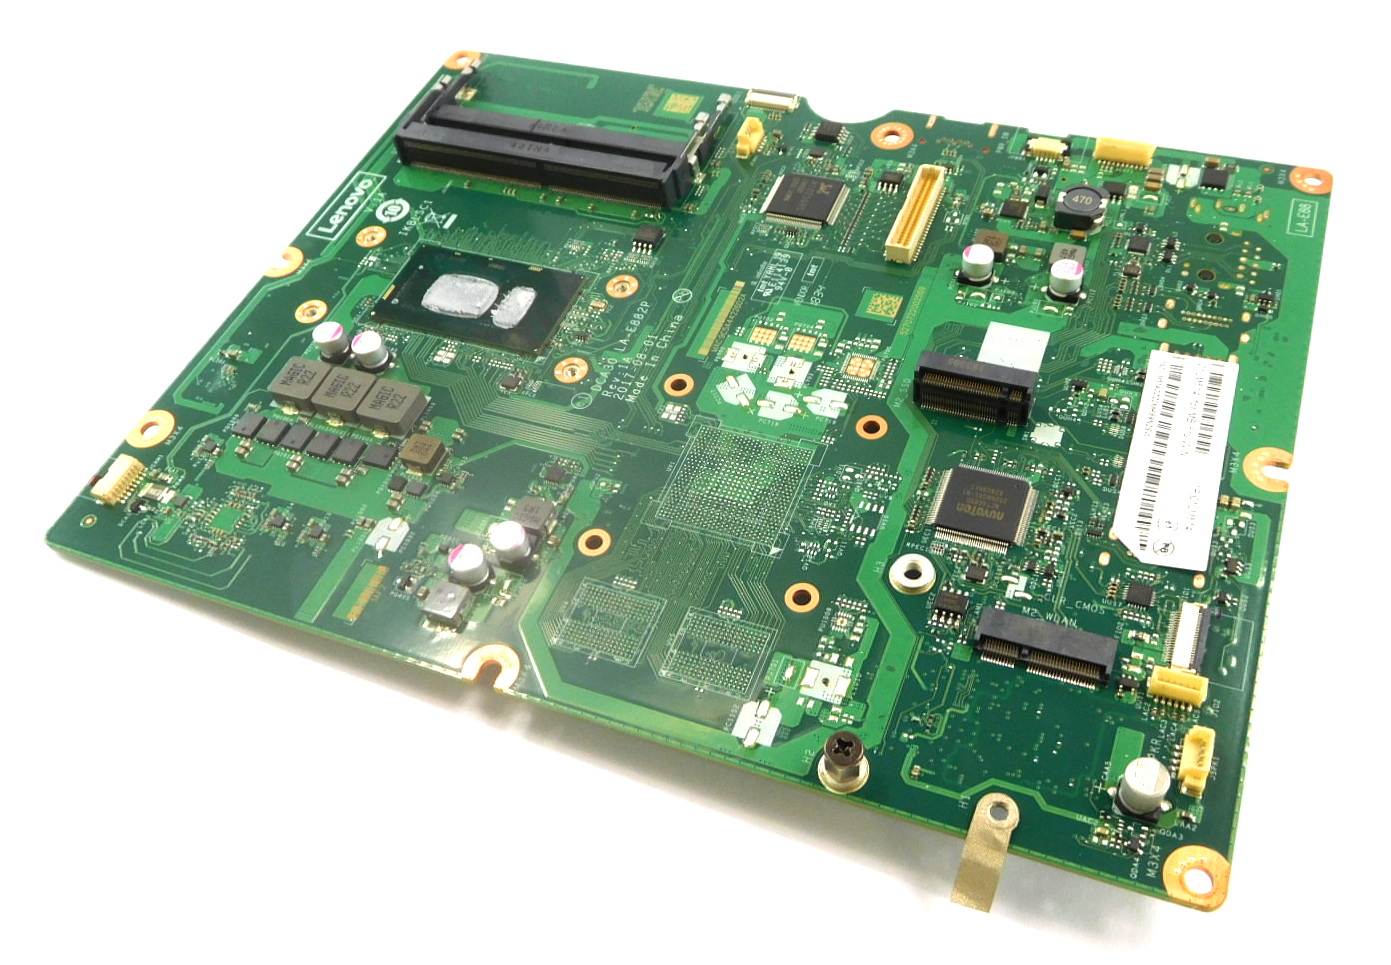 01LM514 Lenovo ideacentre AiO PC 520-22IKU Motherboard /w BGA Core i3-7020U CPU